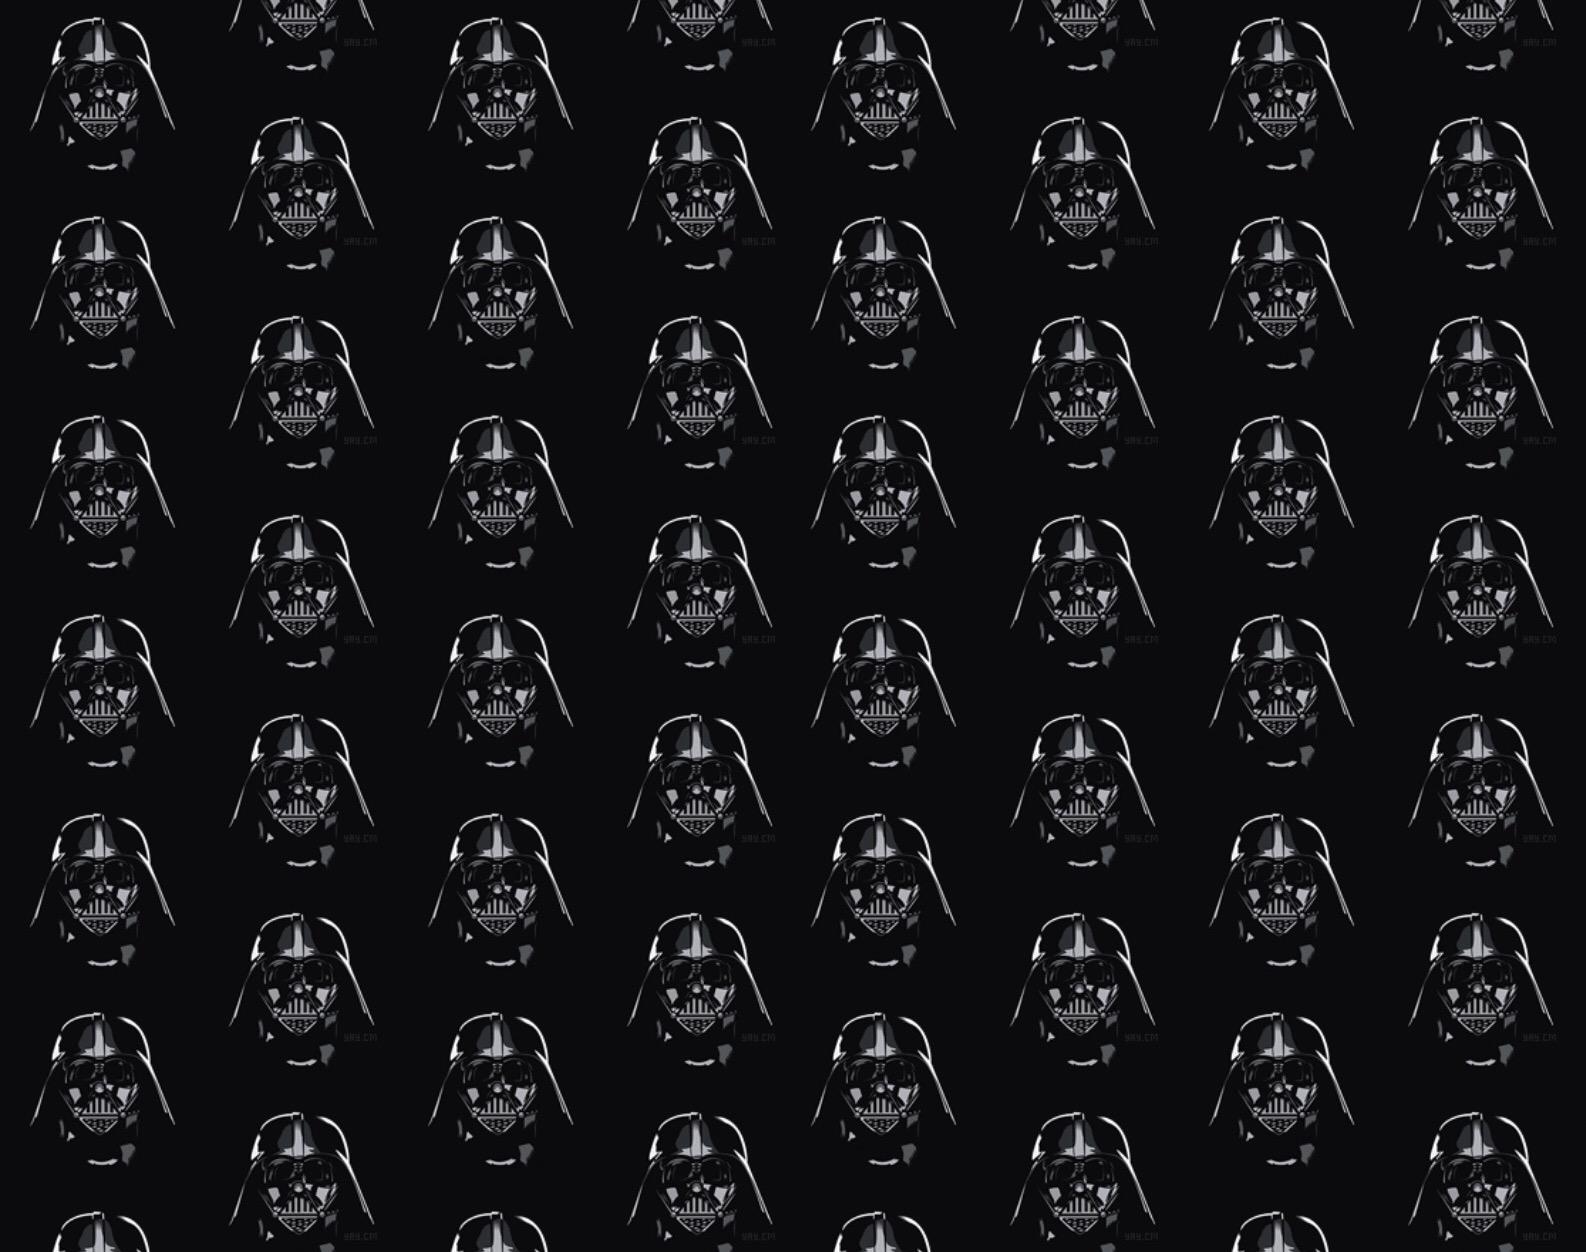 Star Wars Darth Vadar Wallpaper Patterns Backgrounds Wallpaper